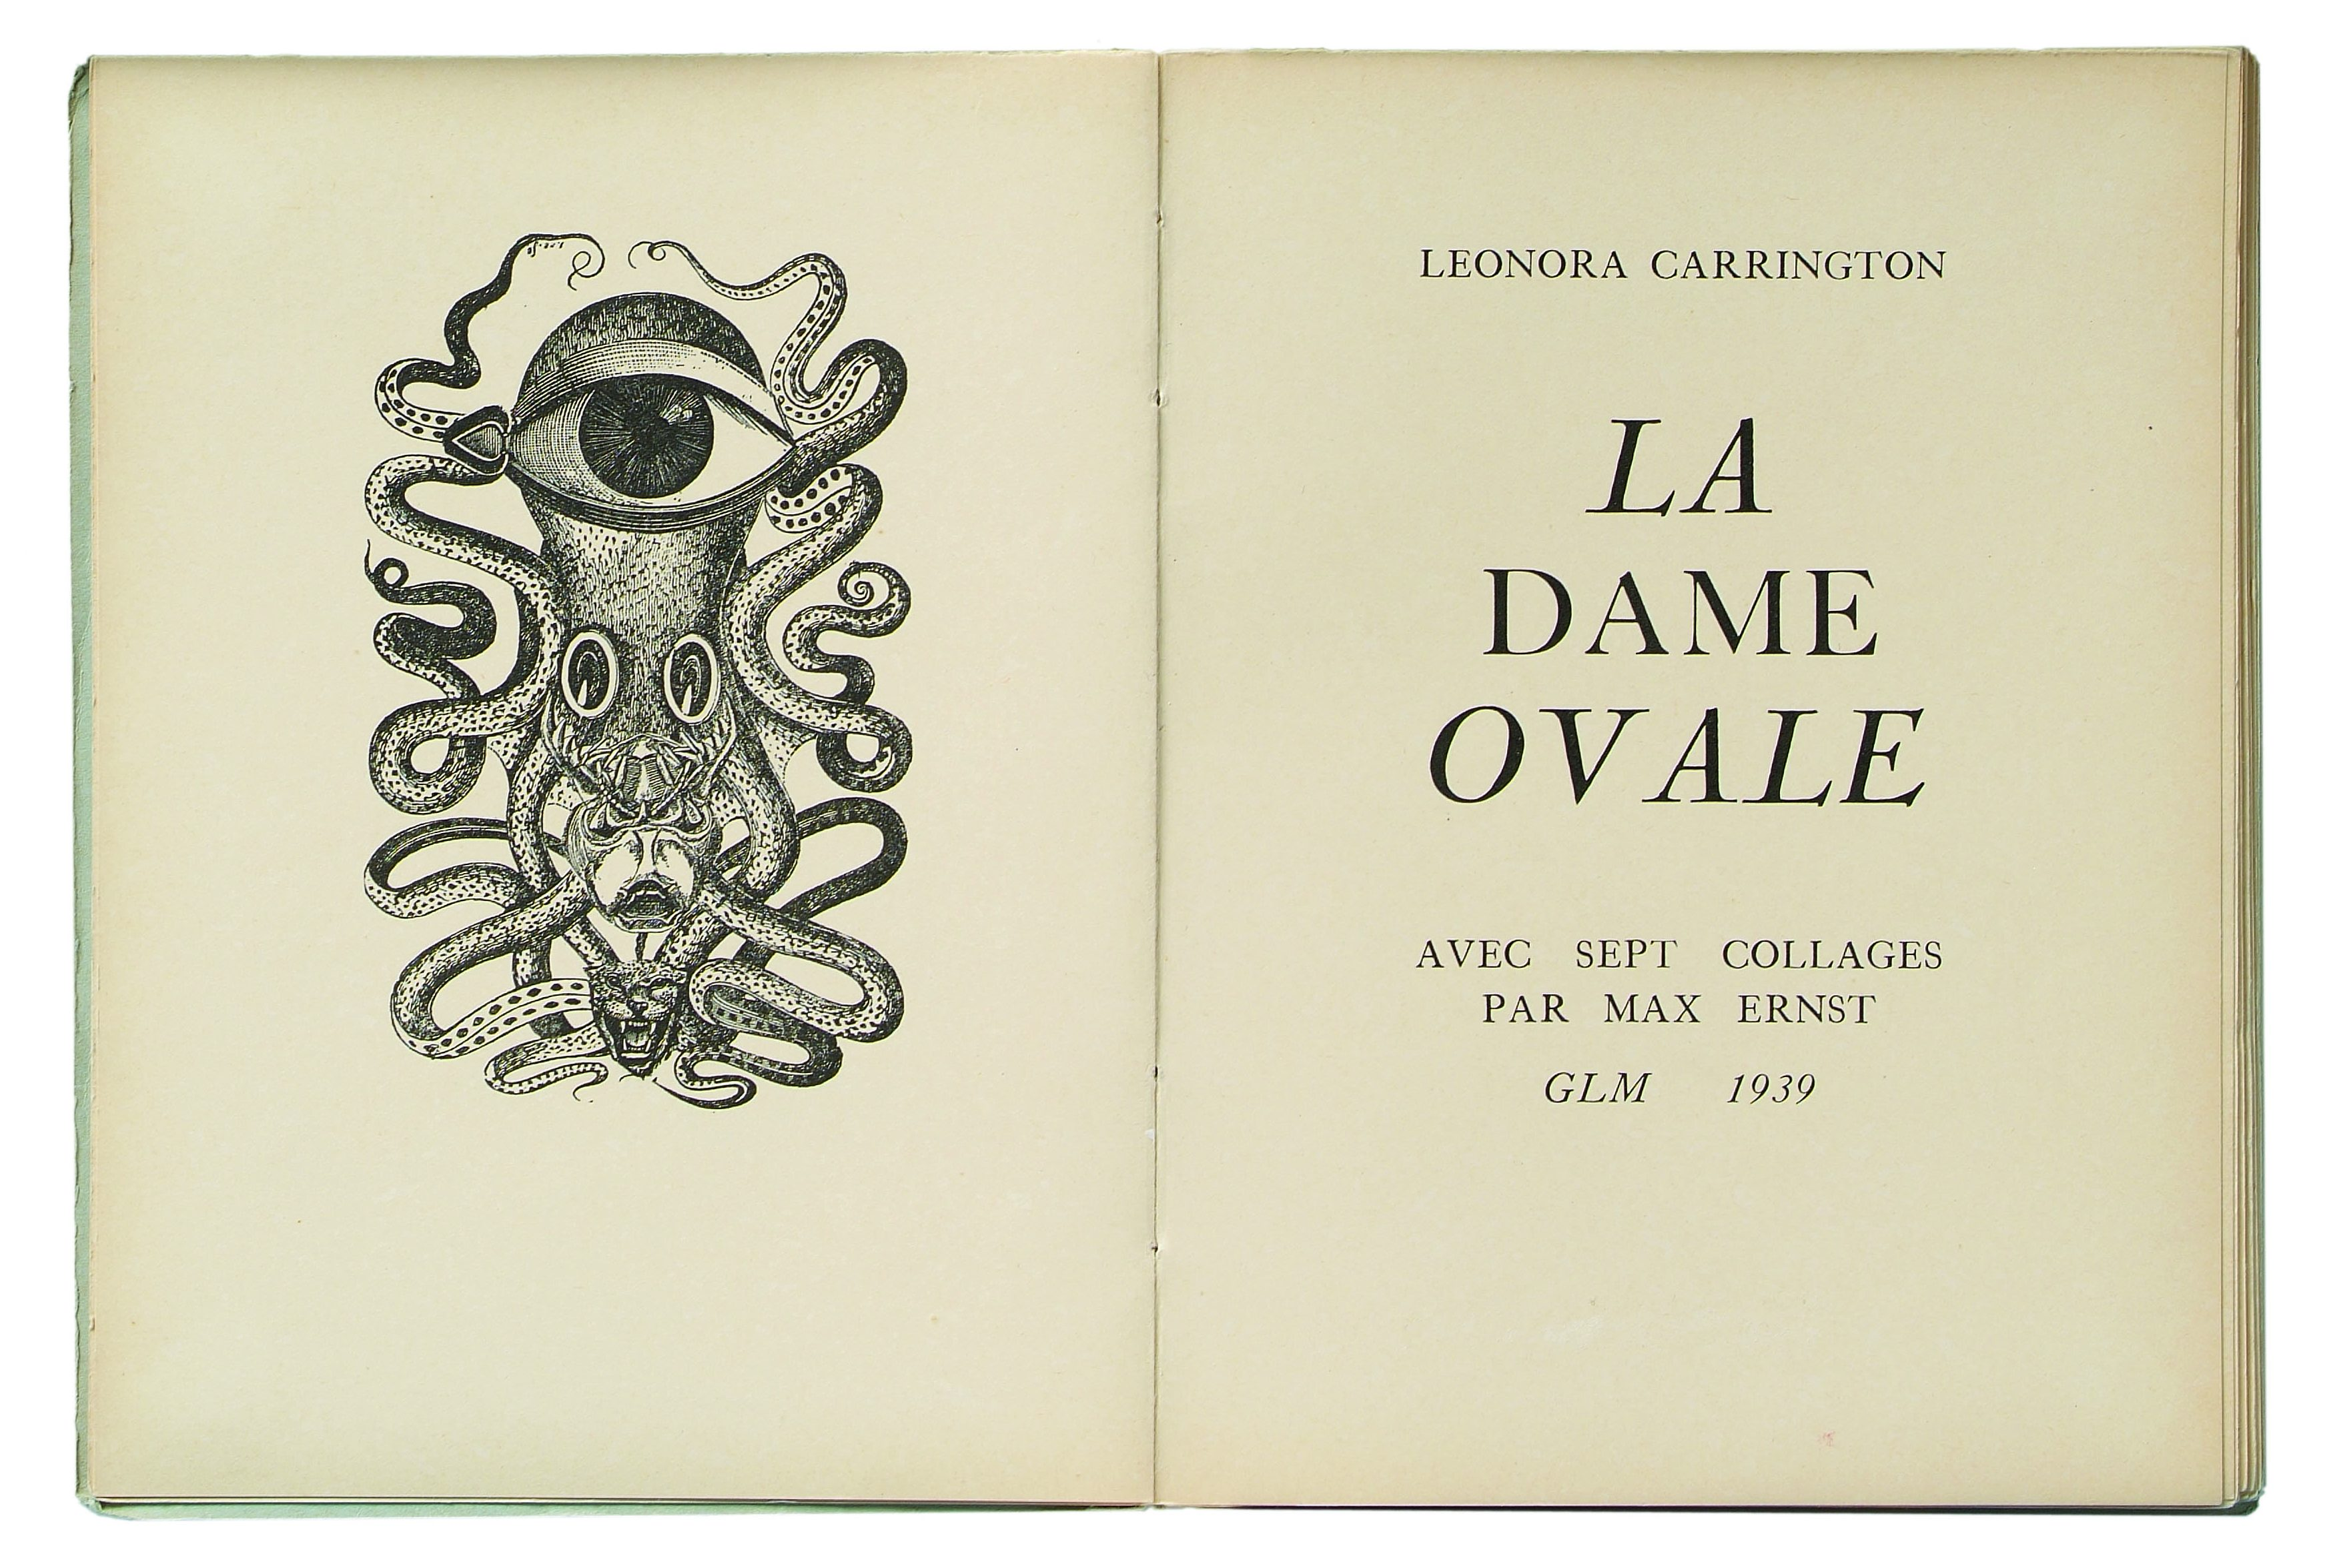 Max Ernst, illustratie La dame ovale, 1939. The Würth Collection, papier, drukwerk, boek, Leonora Carrington